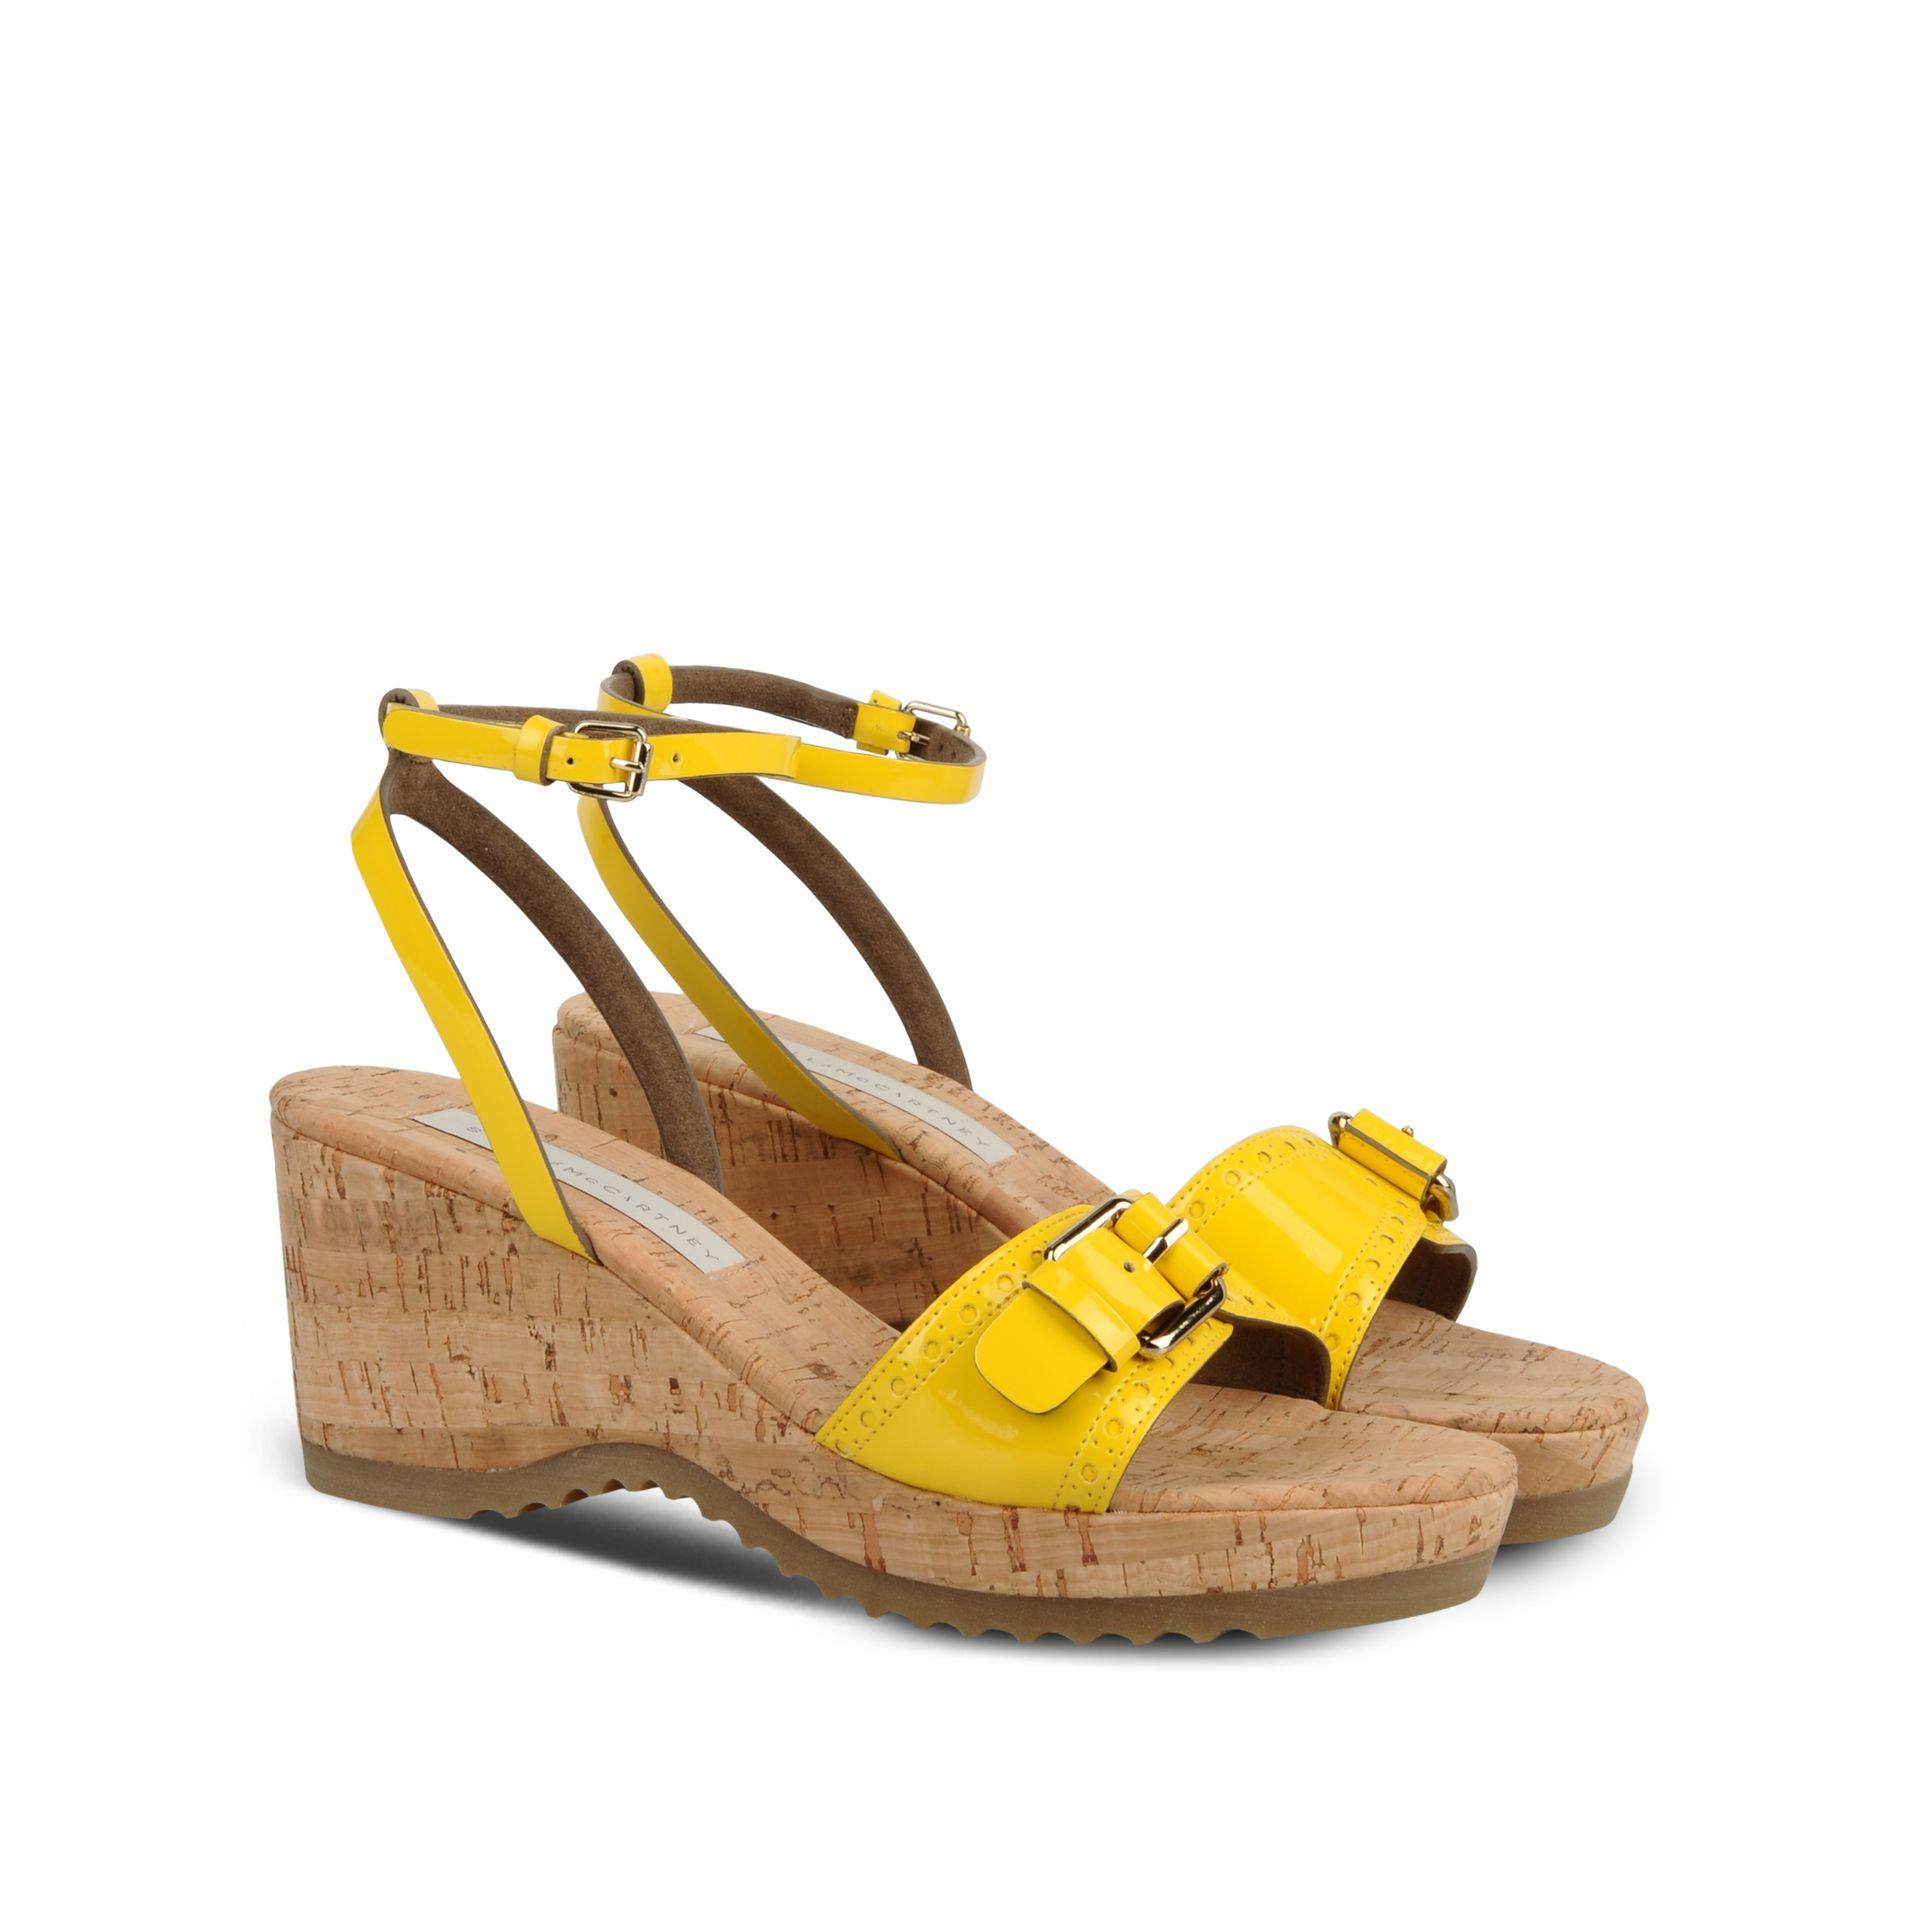 6138b328cf1 Lyst - Stella McCartney Linda Sandals in Yellow